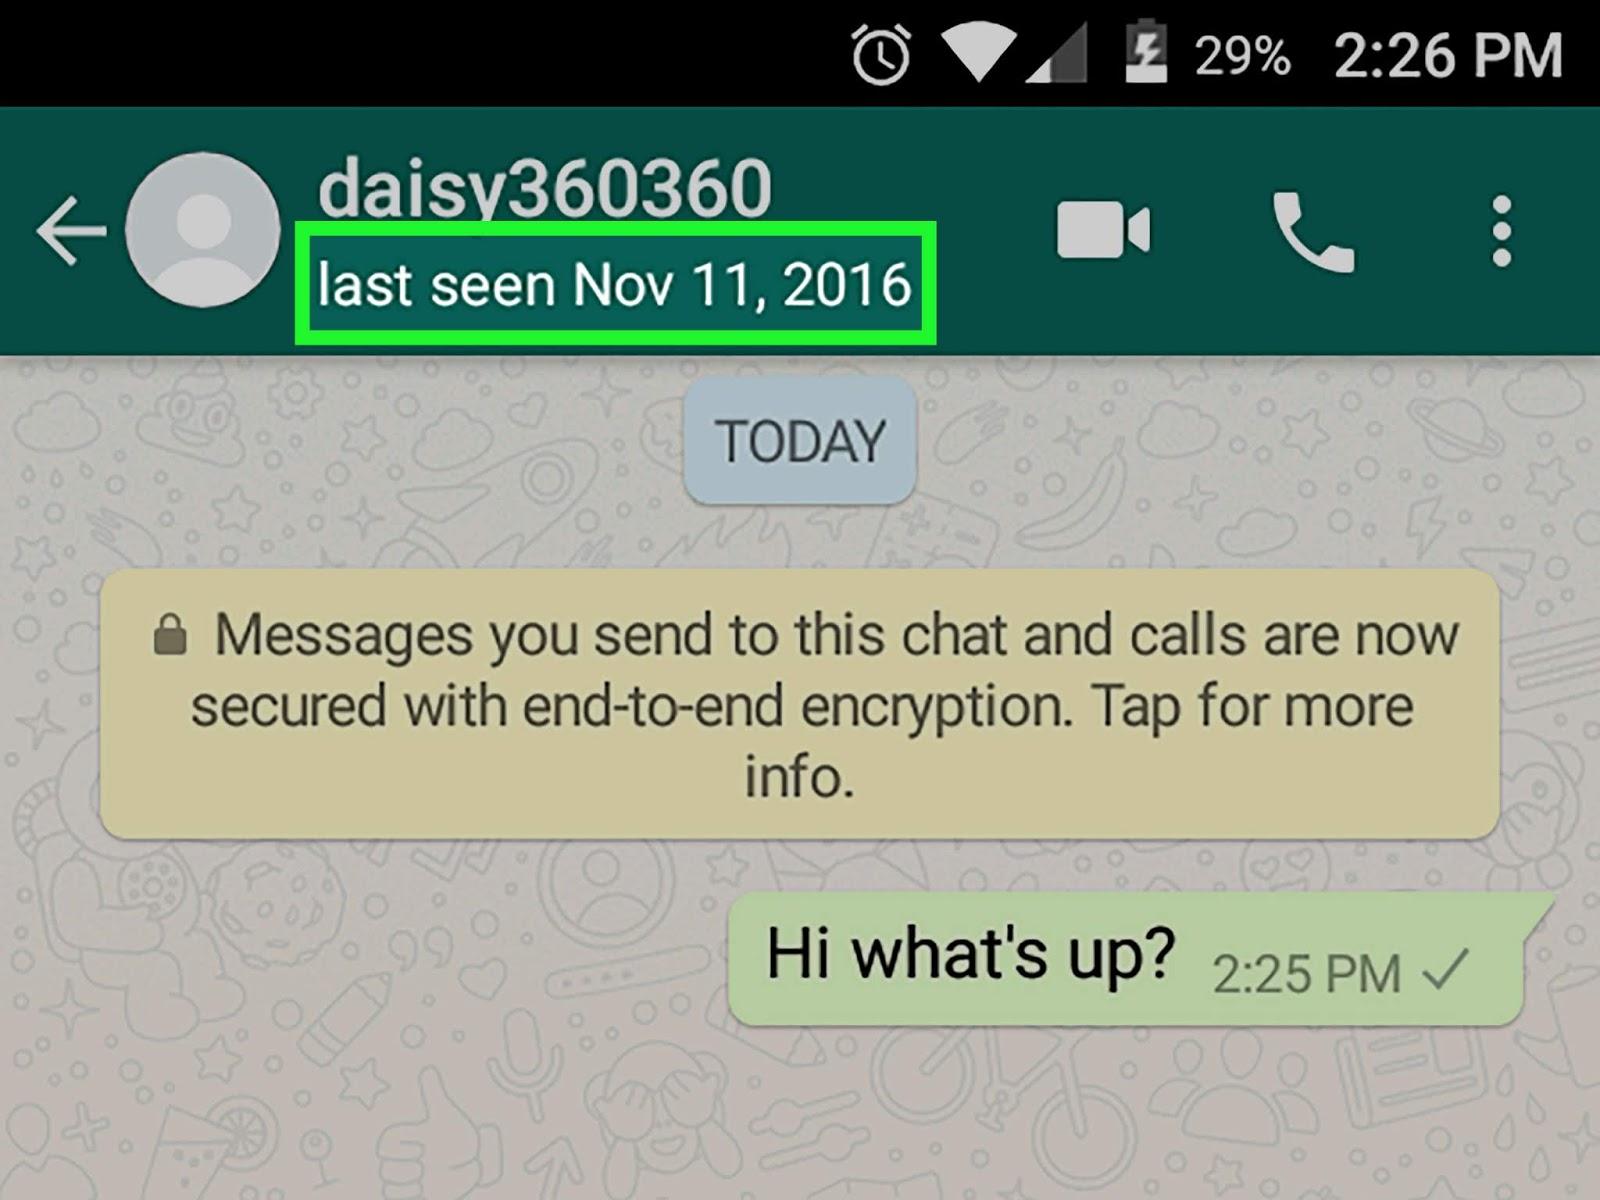 Cara Membuat Last Seen Palsu Di Whatsapp - Rumah Multimedia